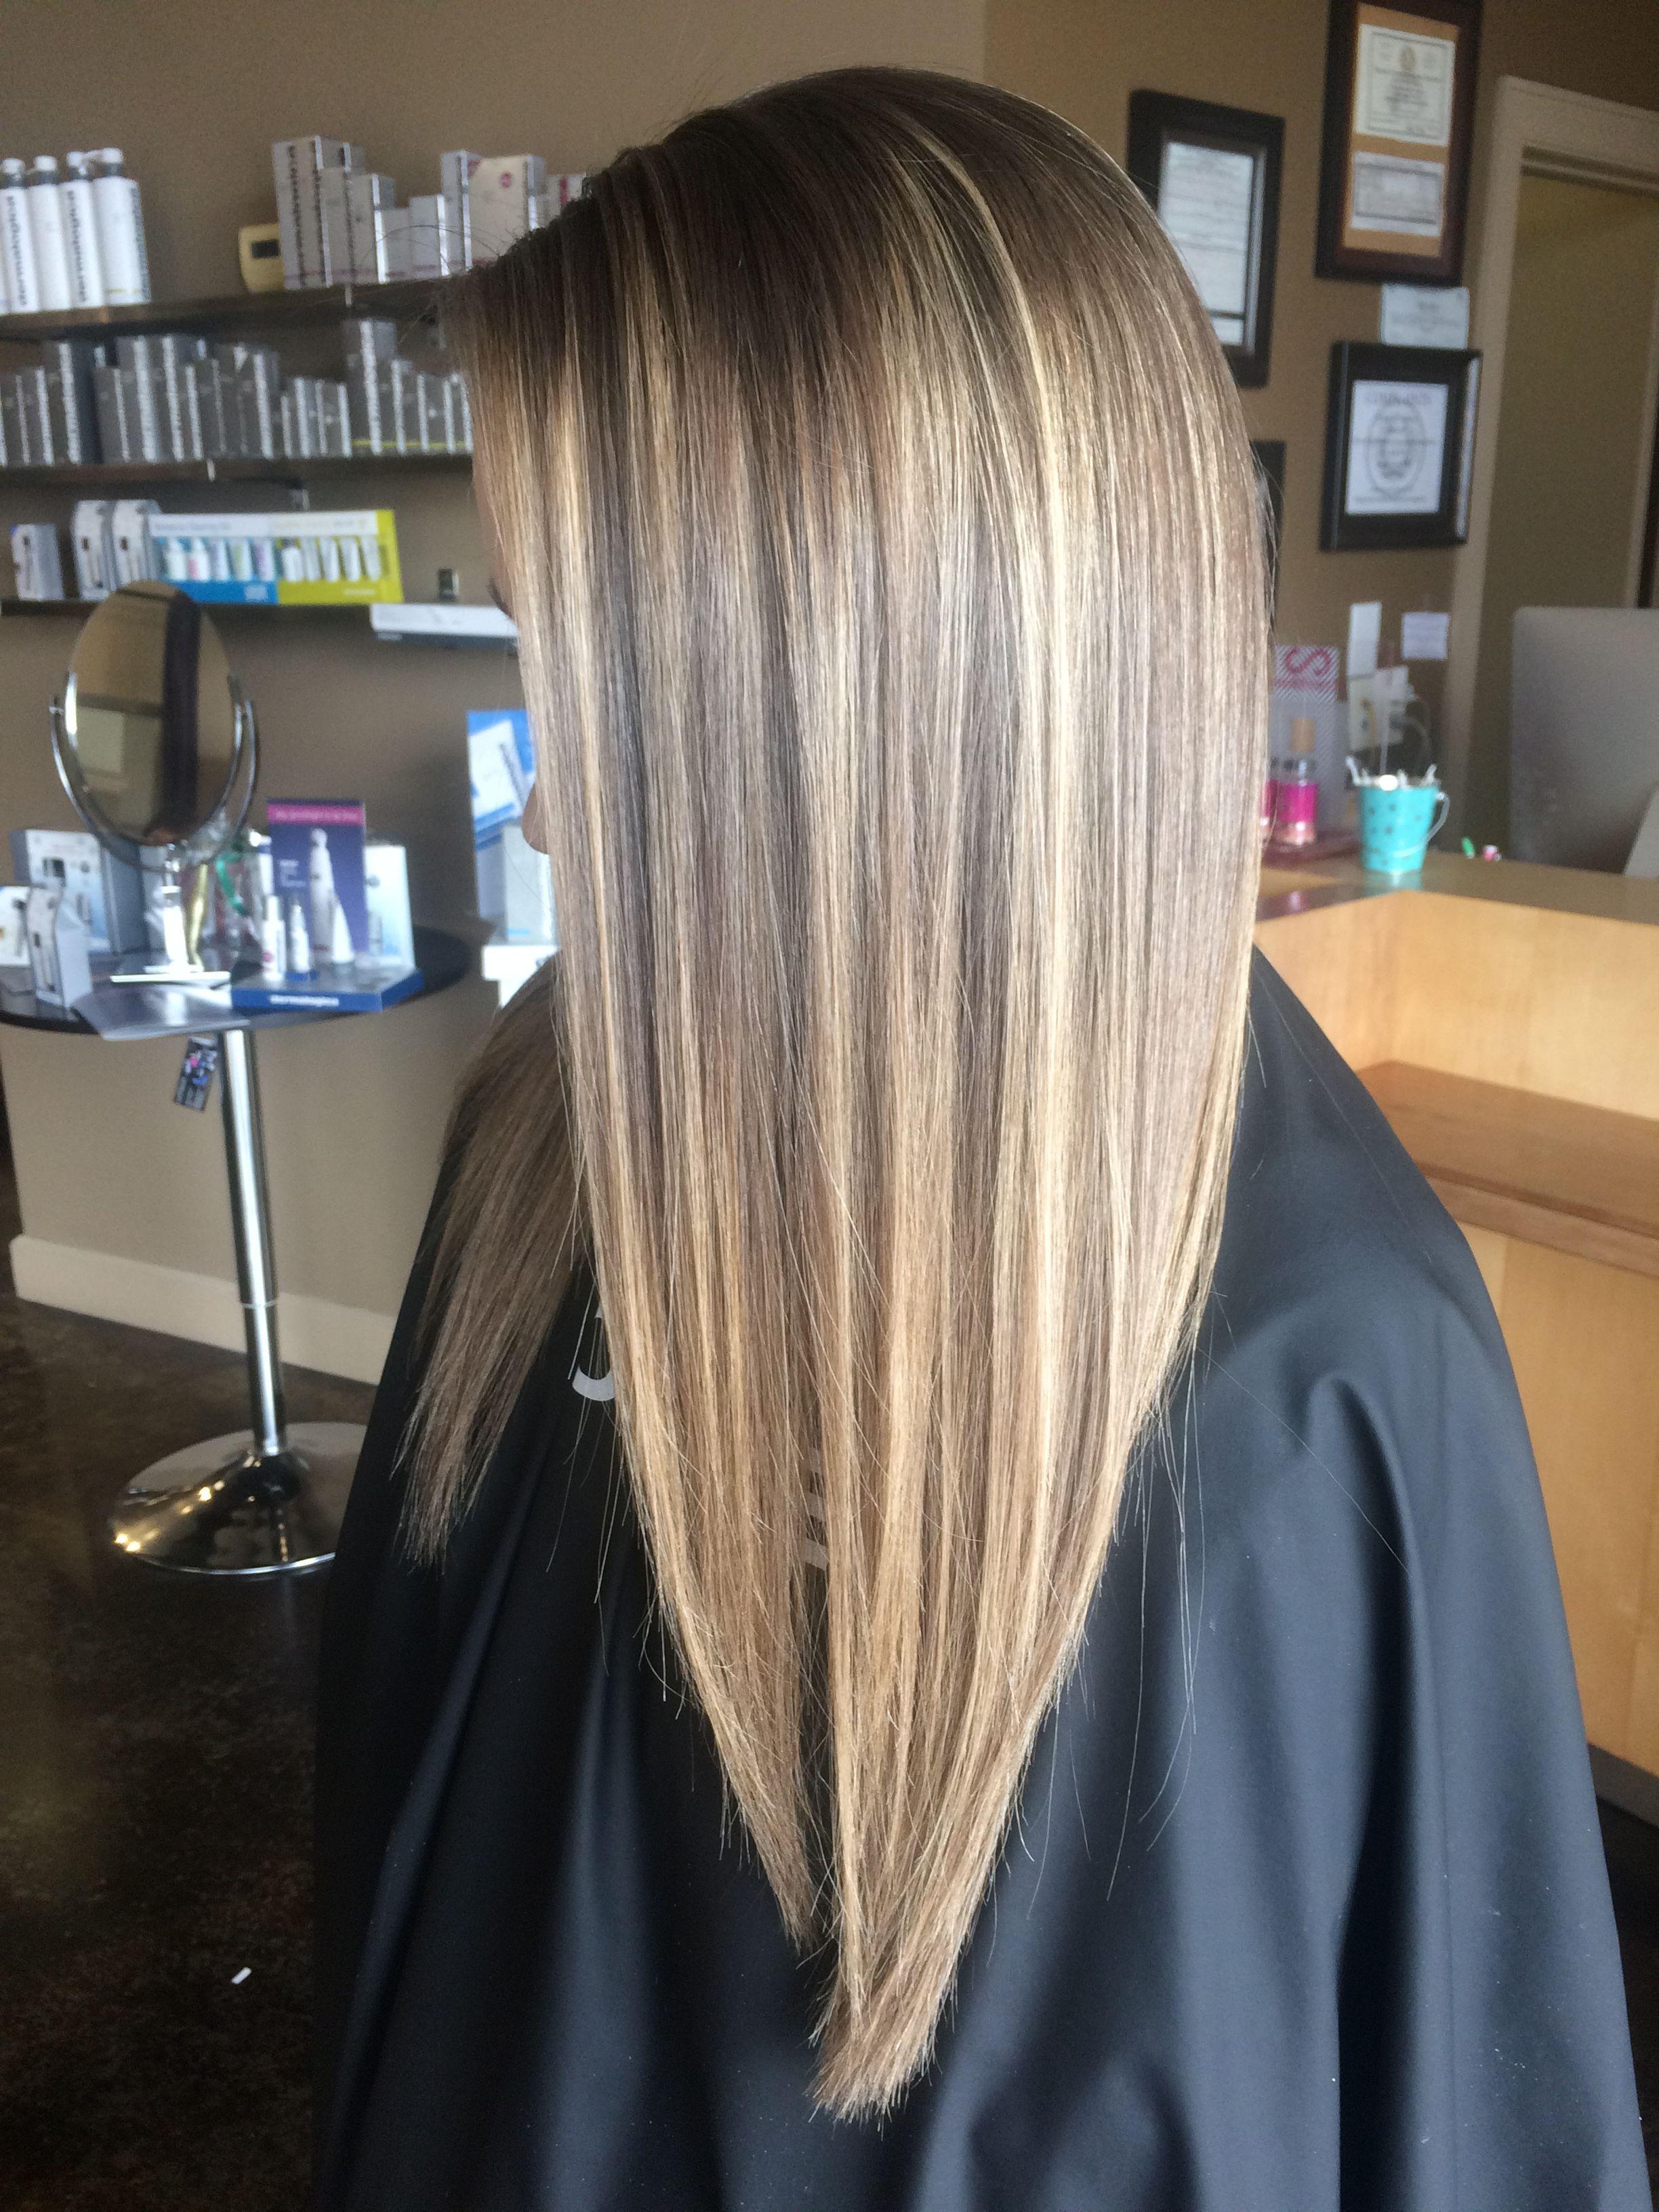 Natural Highlights Long Hair Straight Hair Straight Blonde Hair